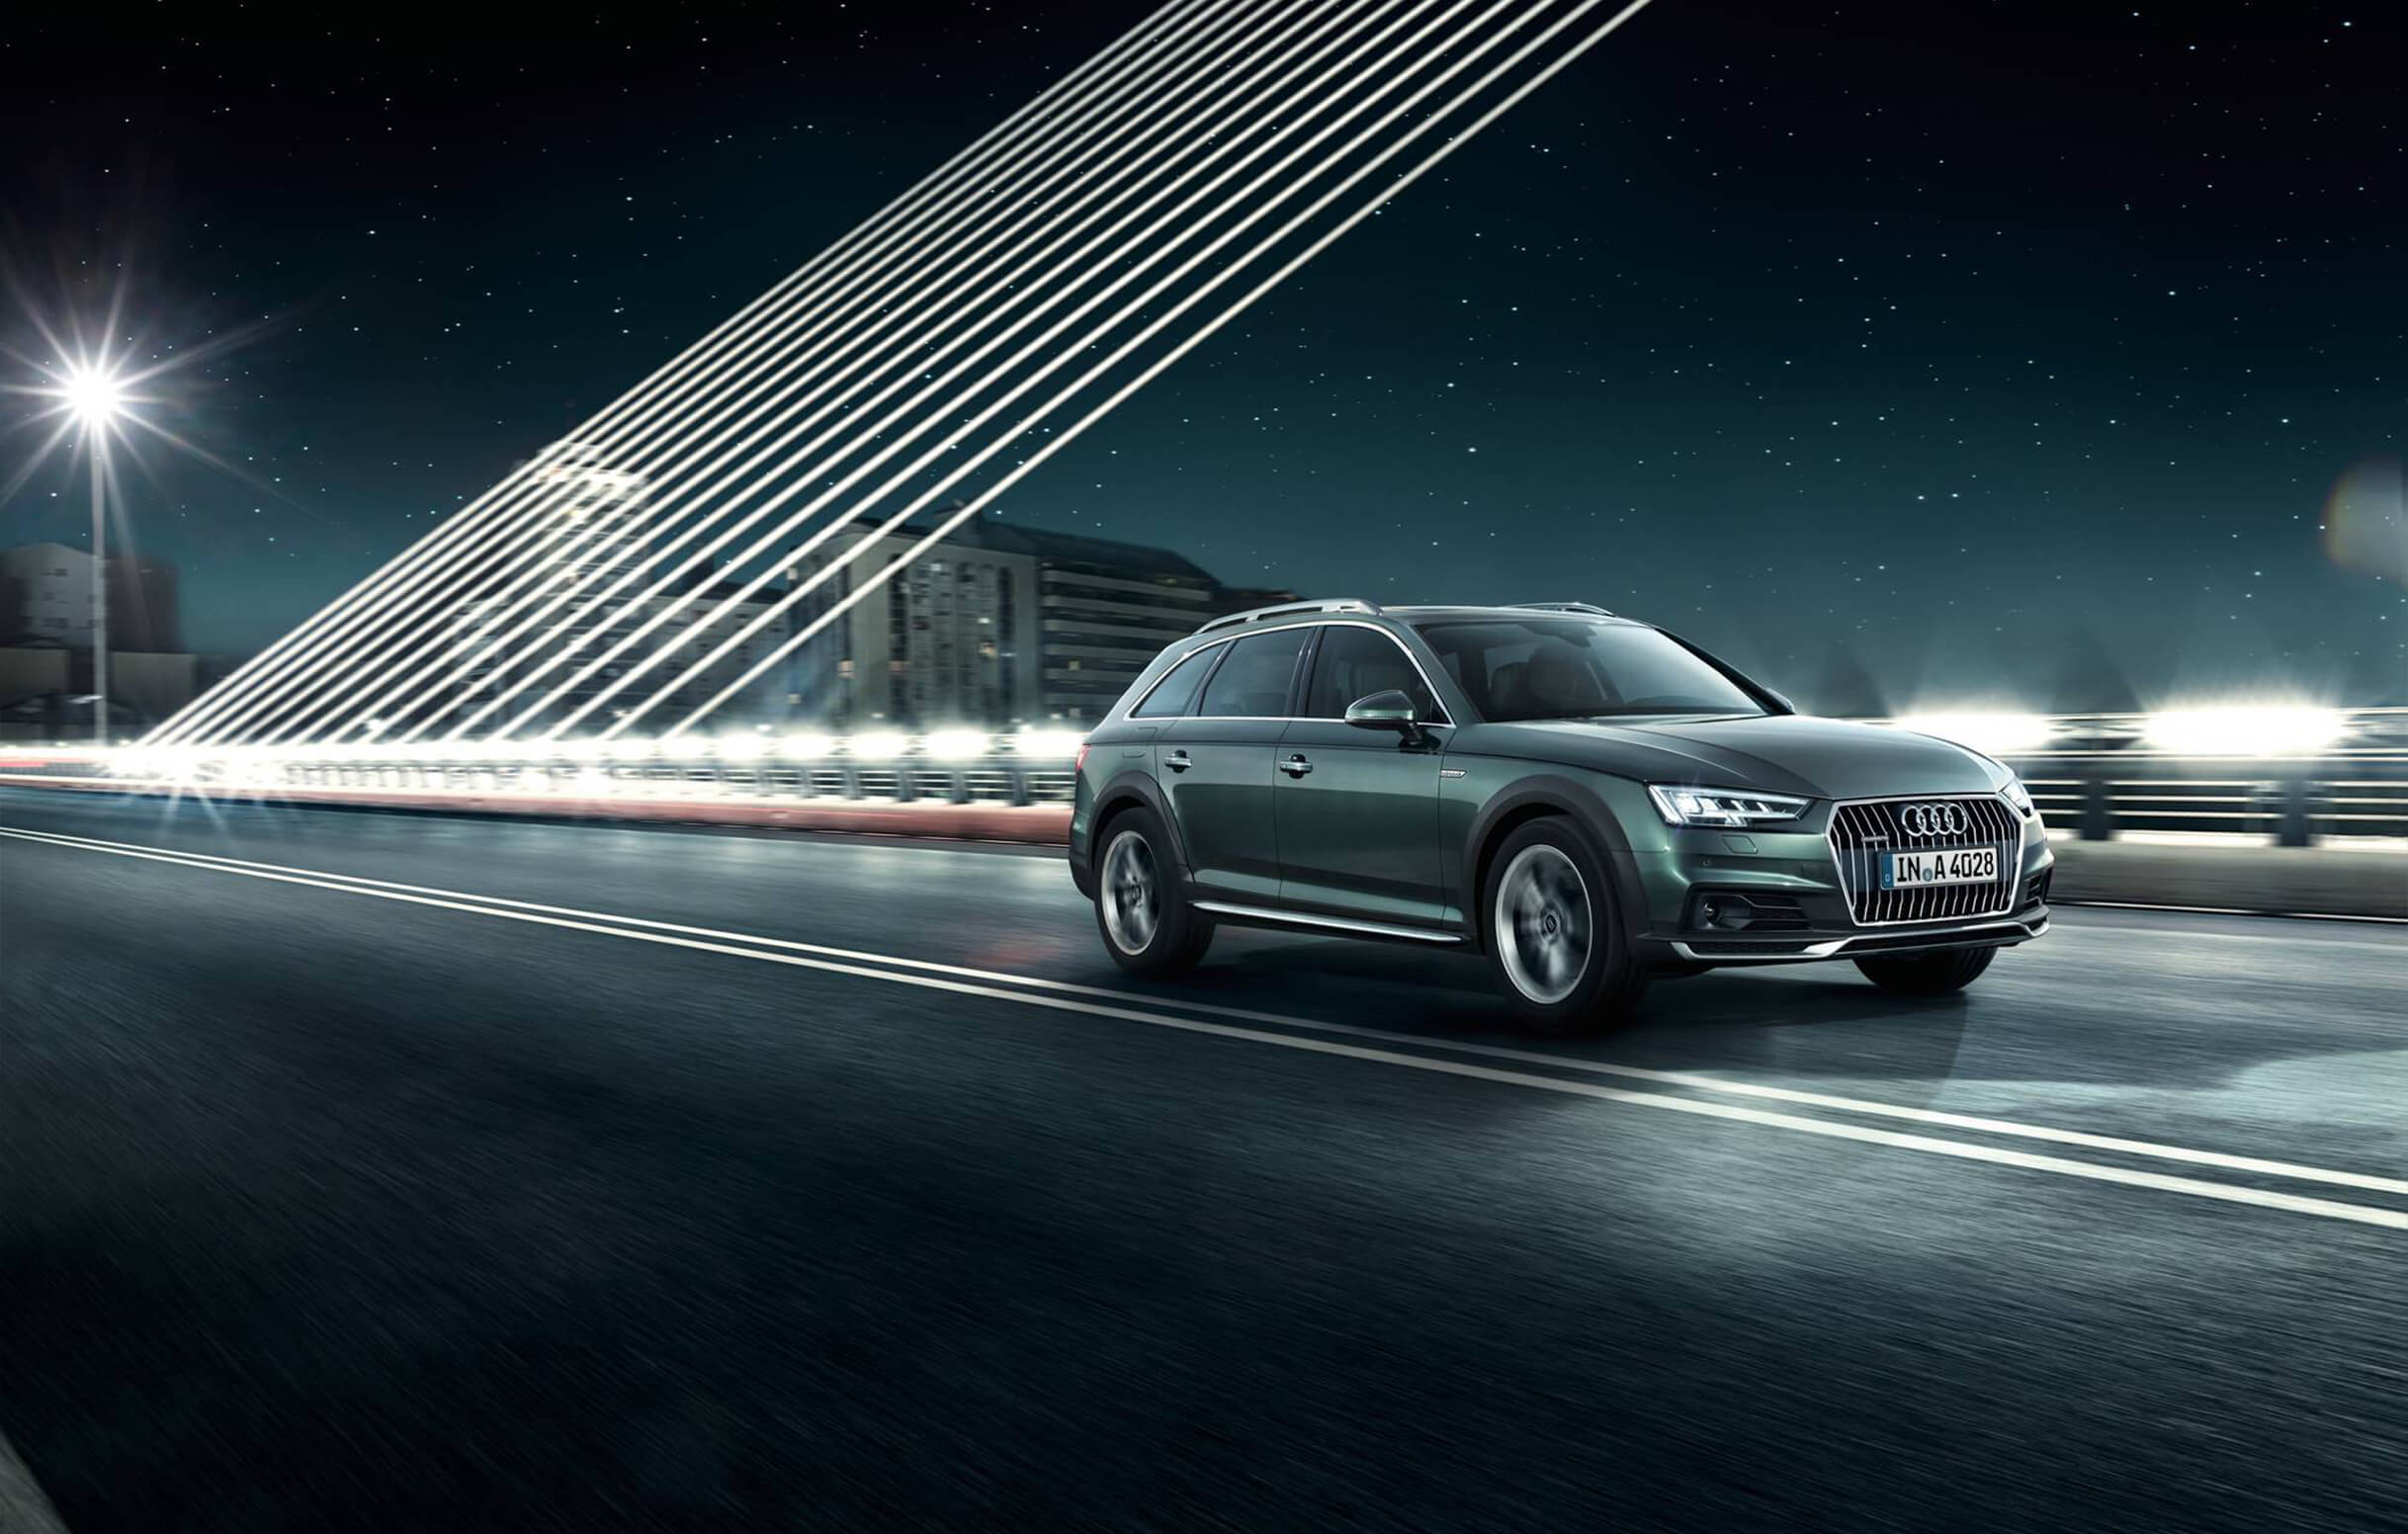 Audi A4 Allroad Quattro. Credit foto: audi.co.uk